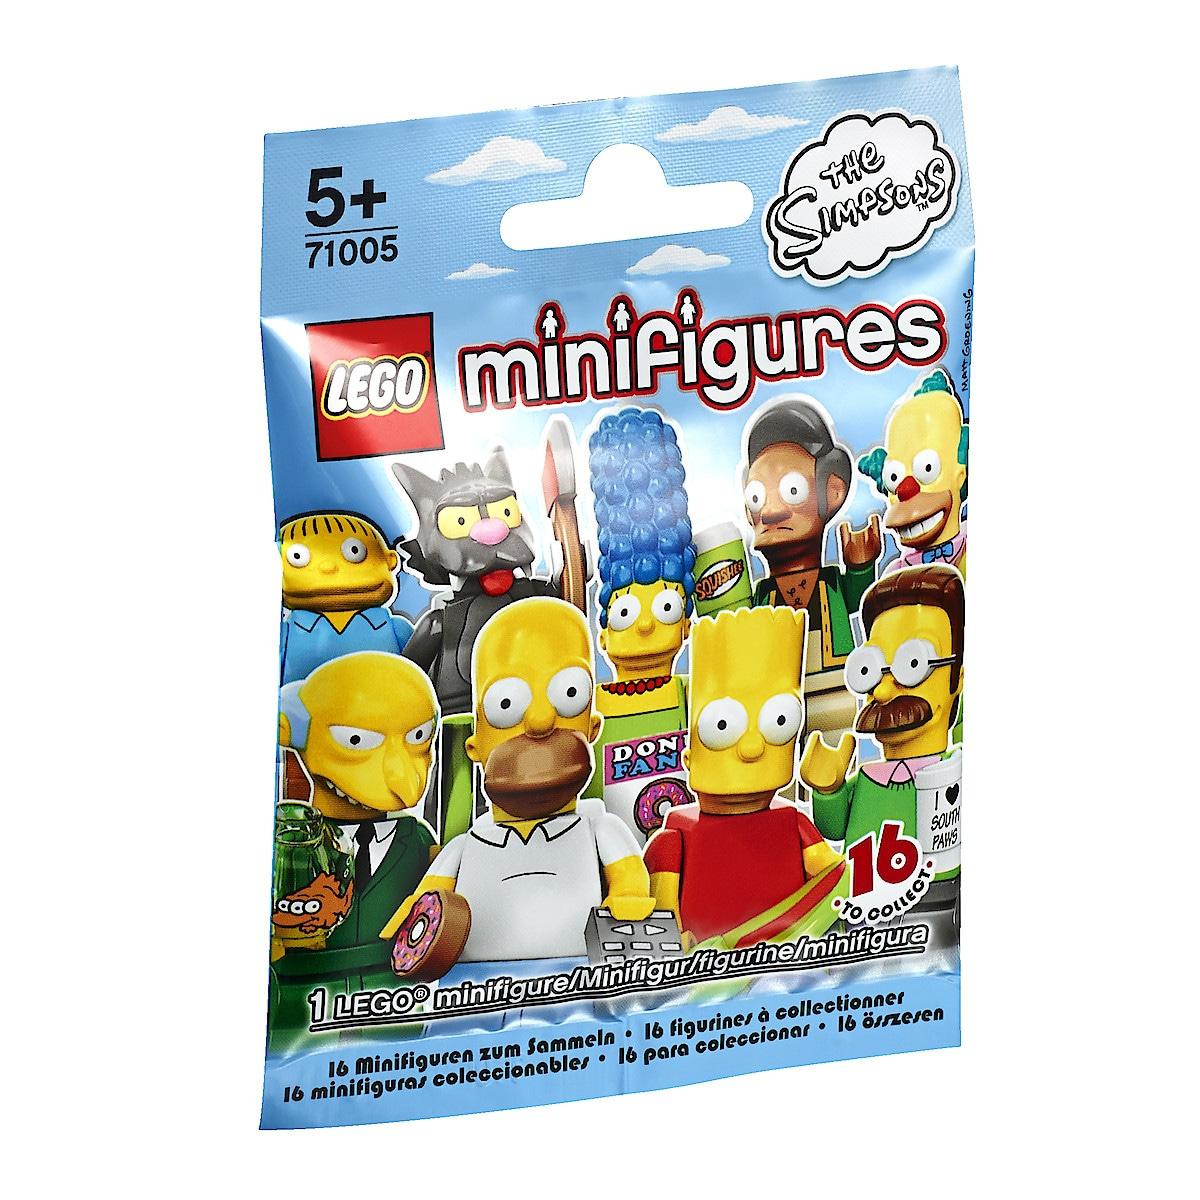 Lego minifigur